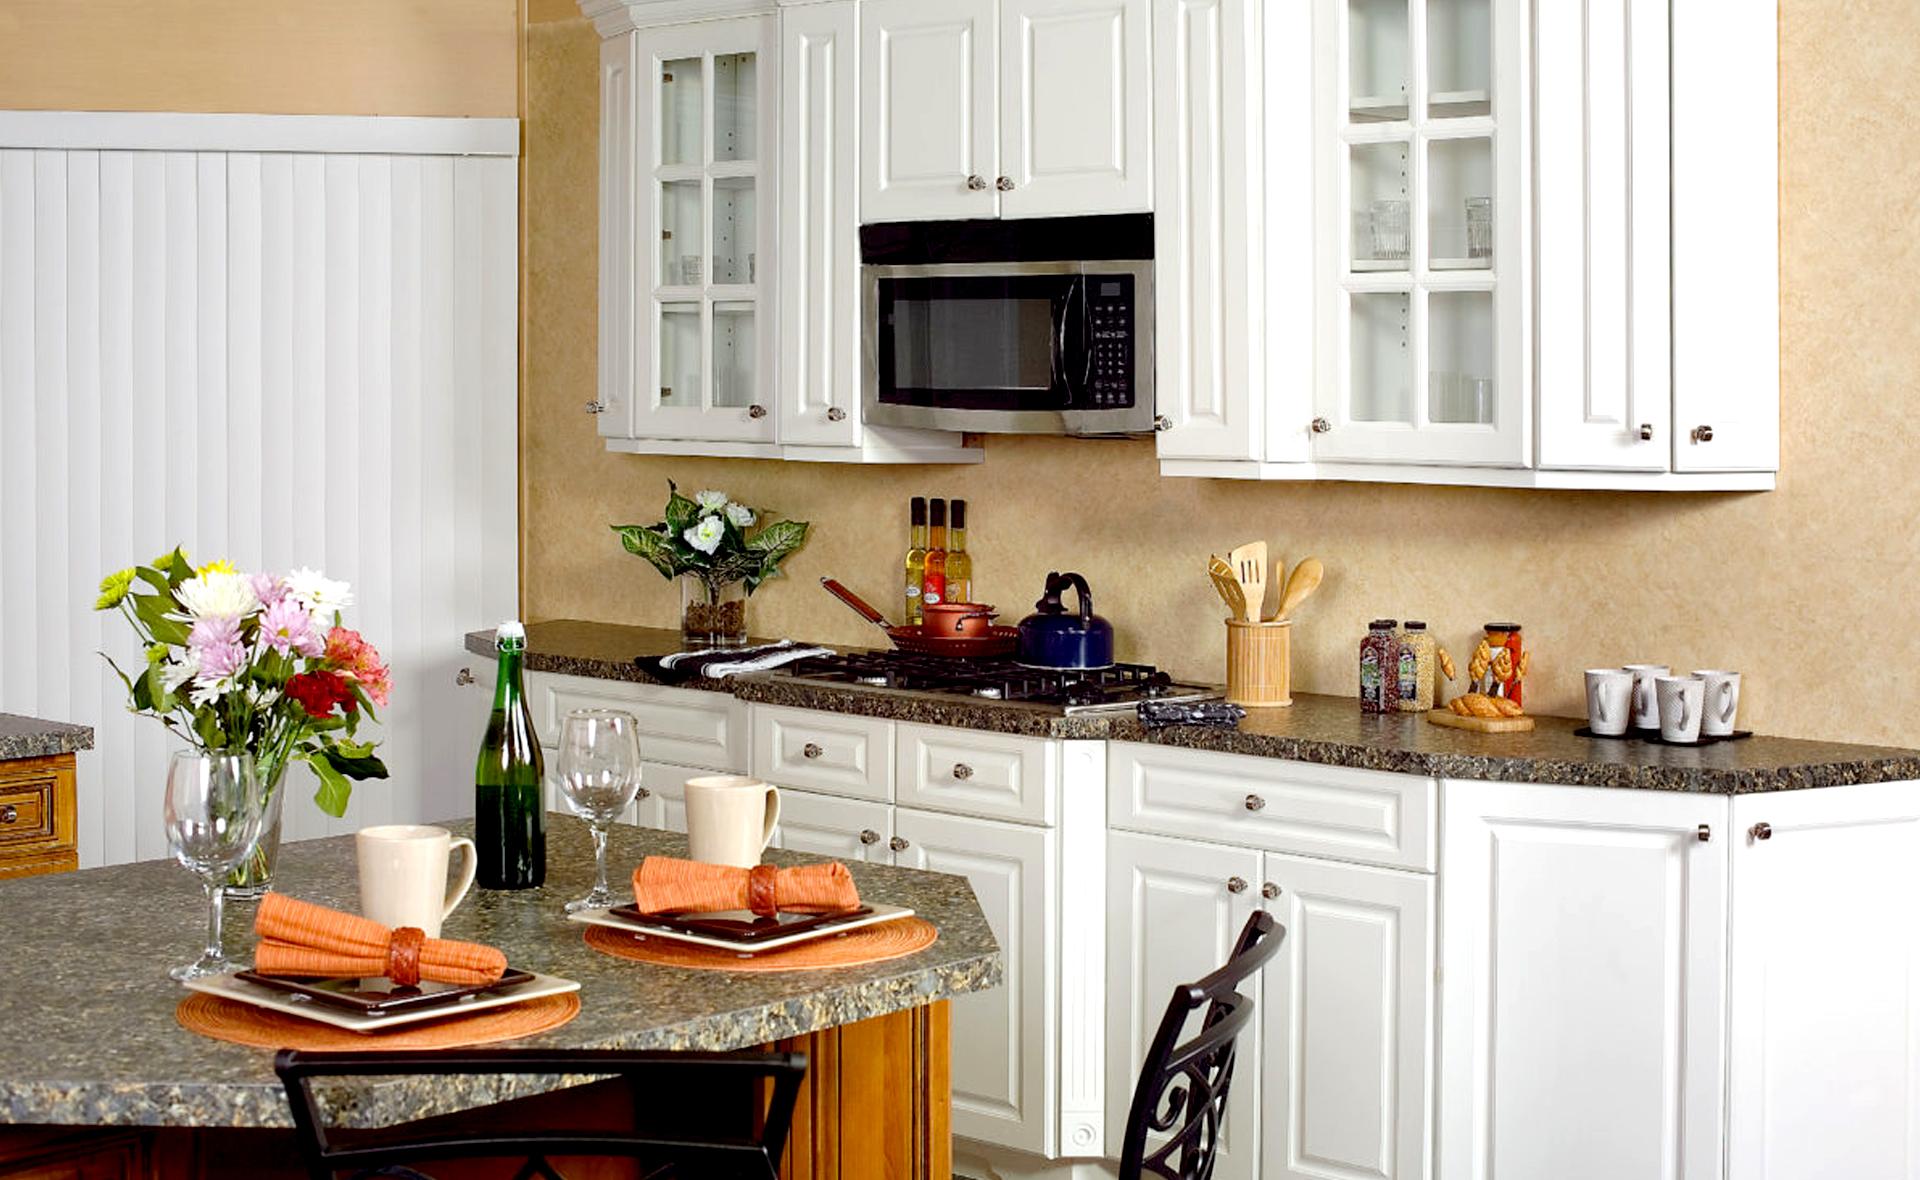 kitchen-renovations-in-essex-county-nj